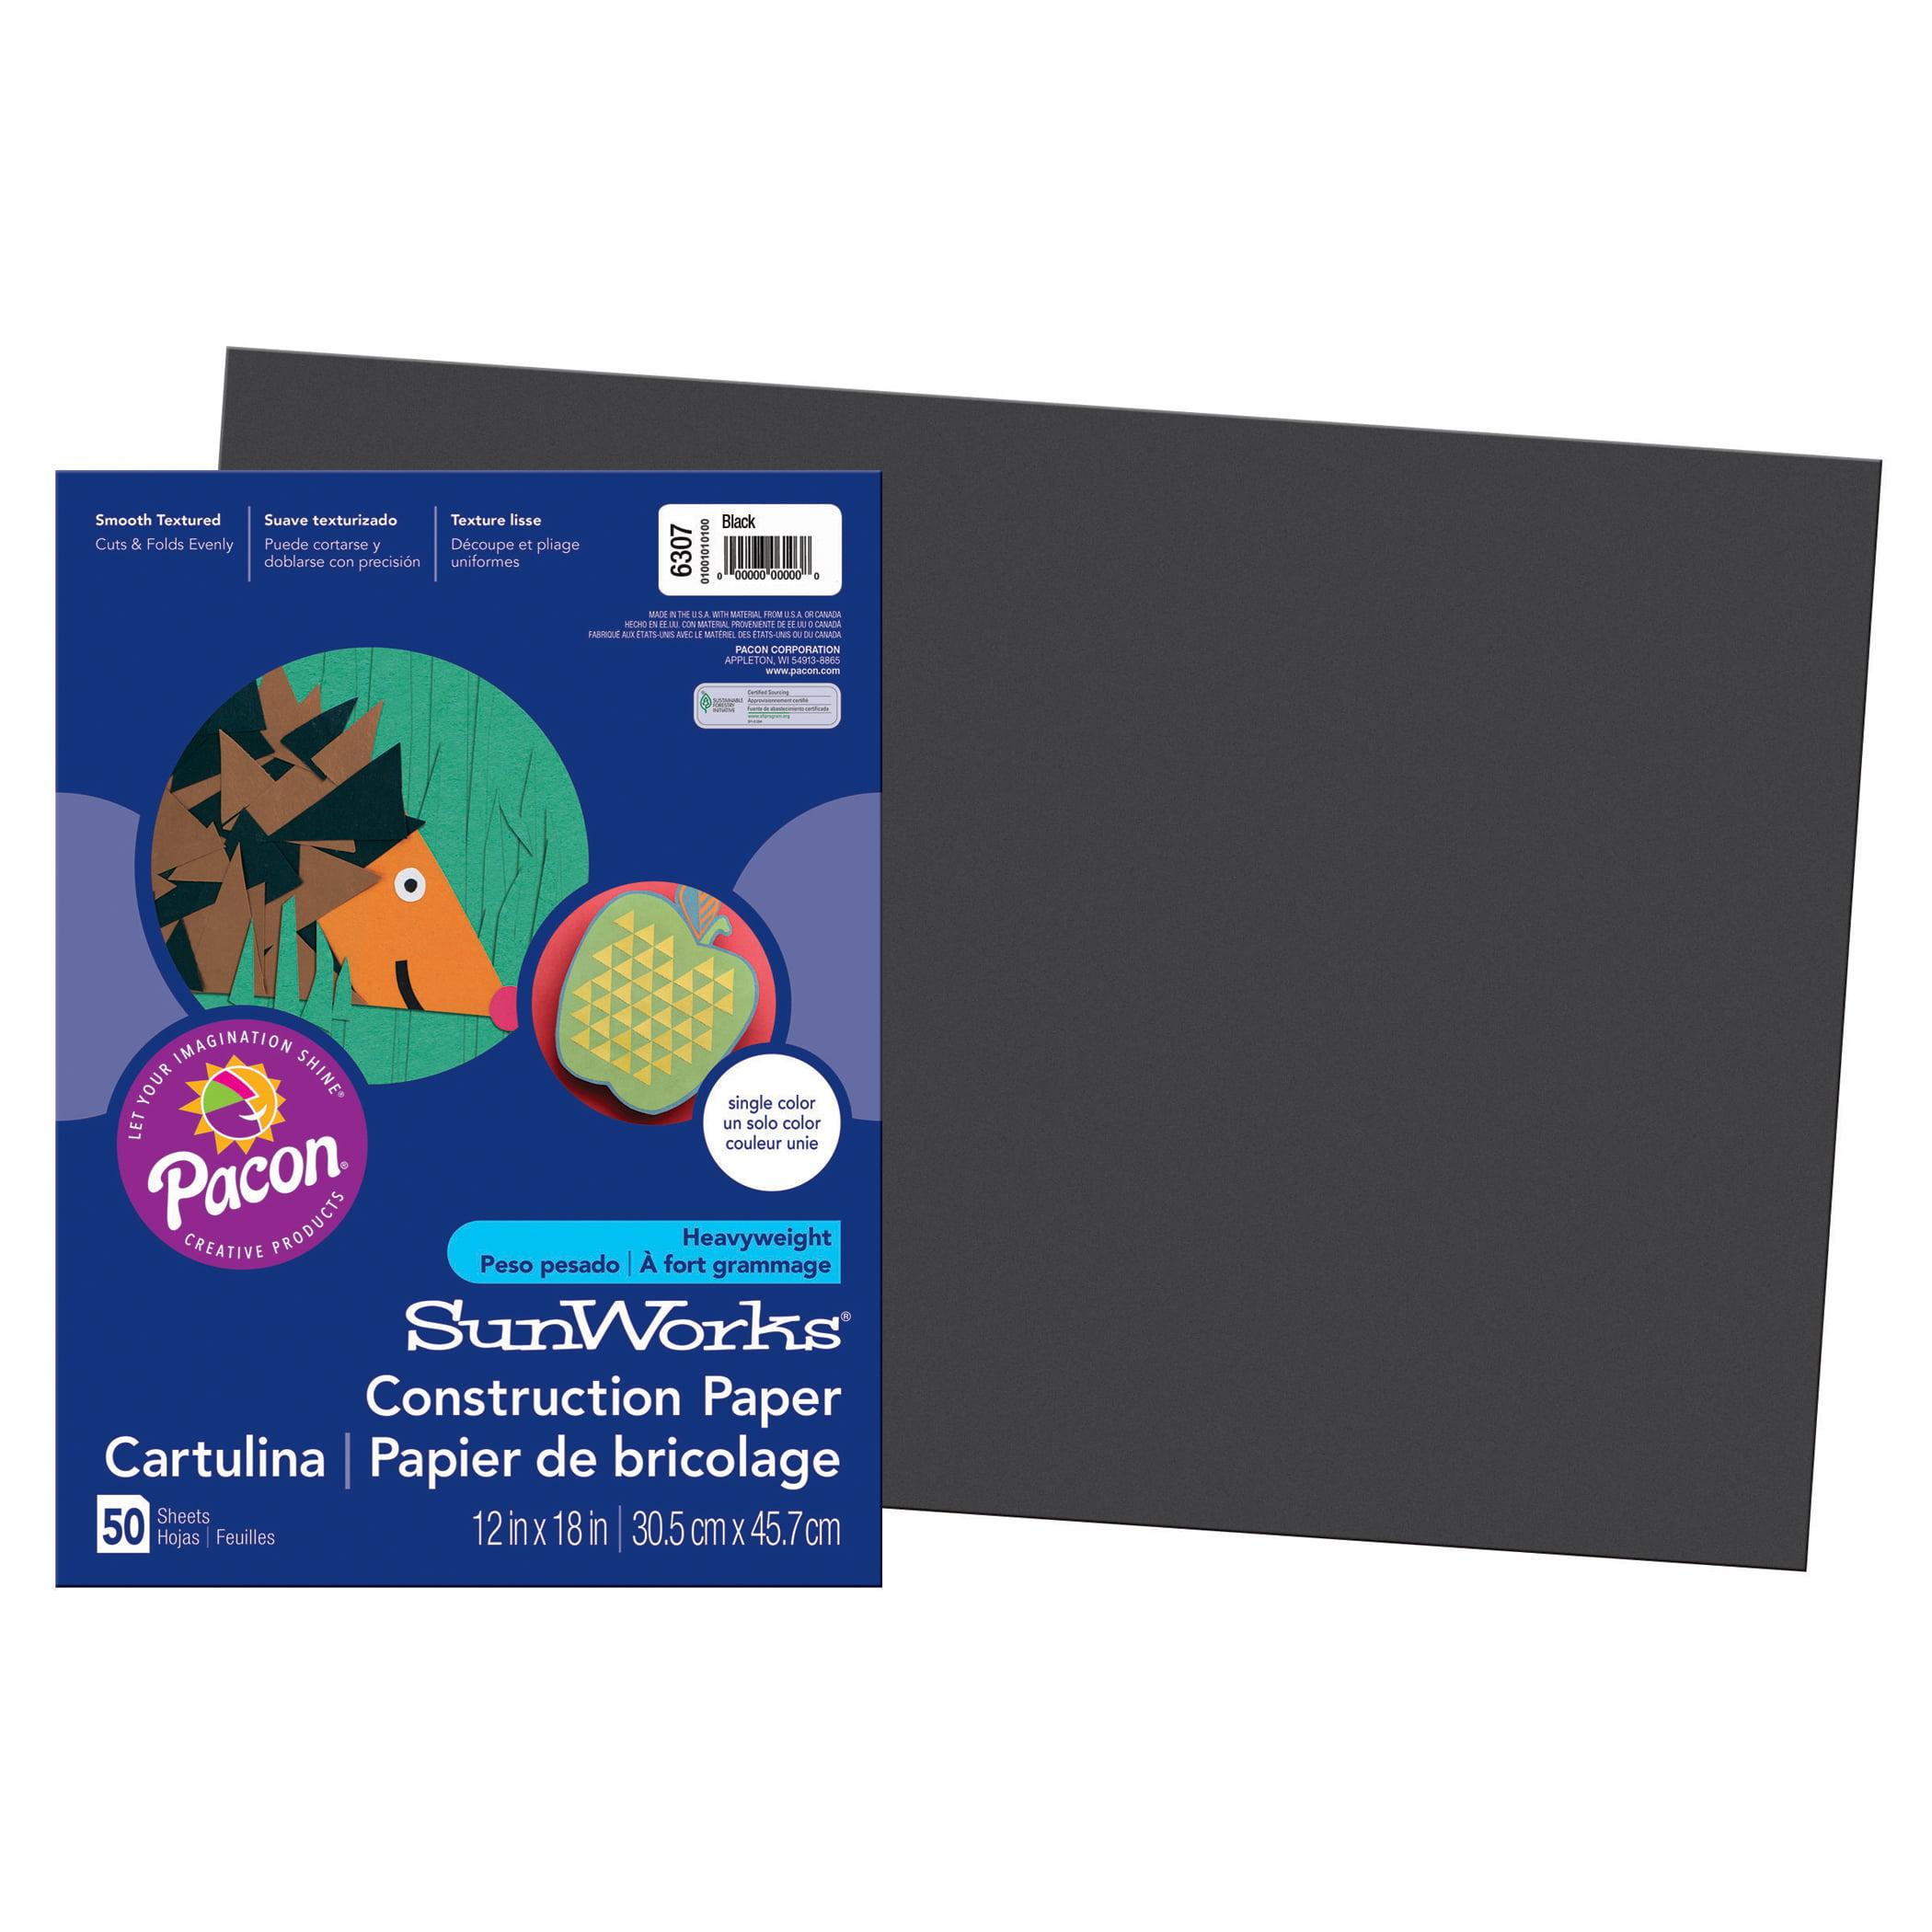 "Pacon® SunWorks® Construction Paper, 12"" x 18"", Black - 50 Sheets per pack, 8 packs"